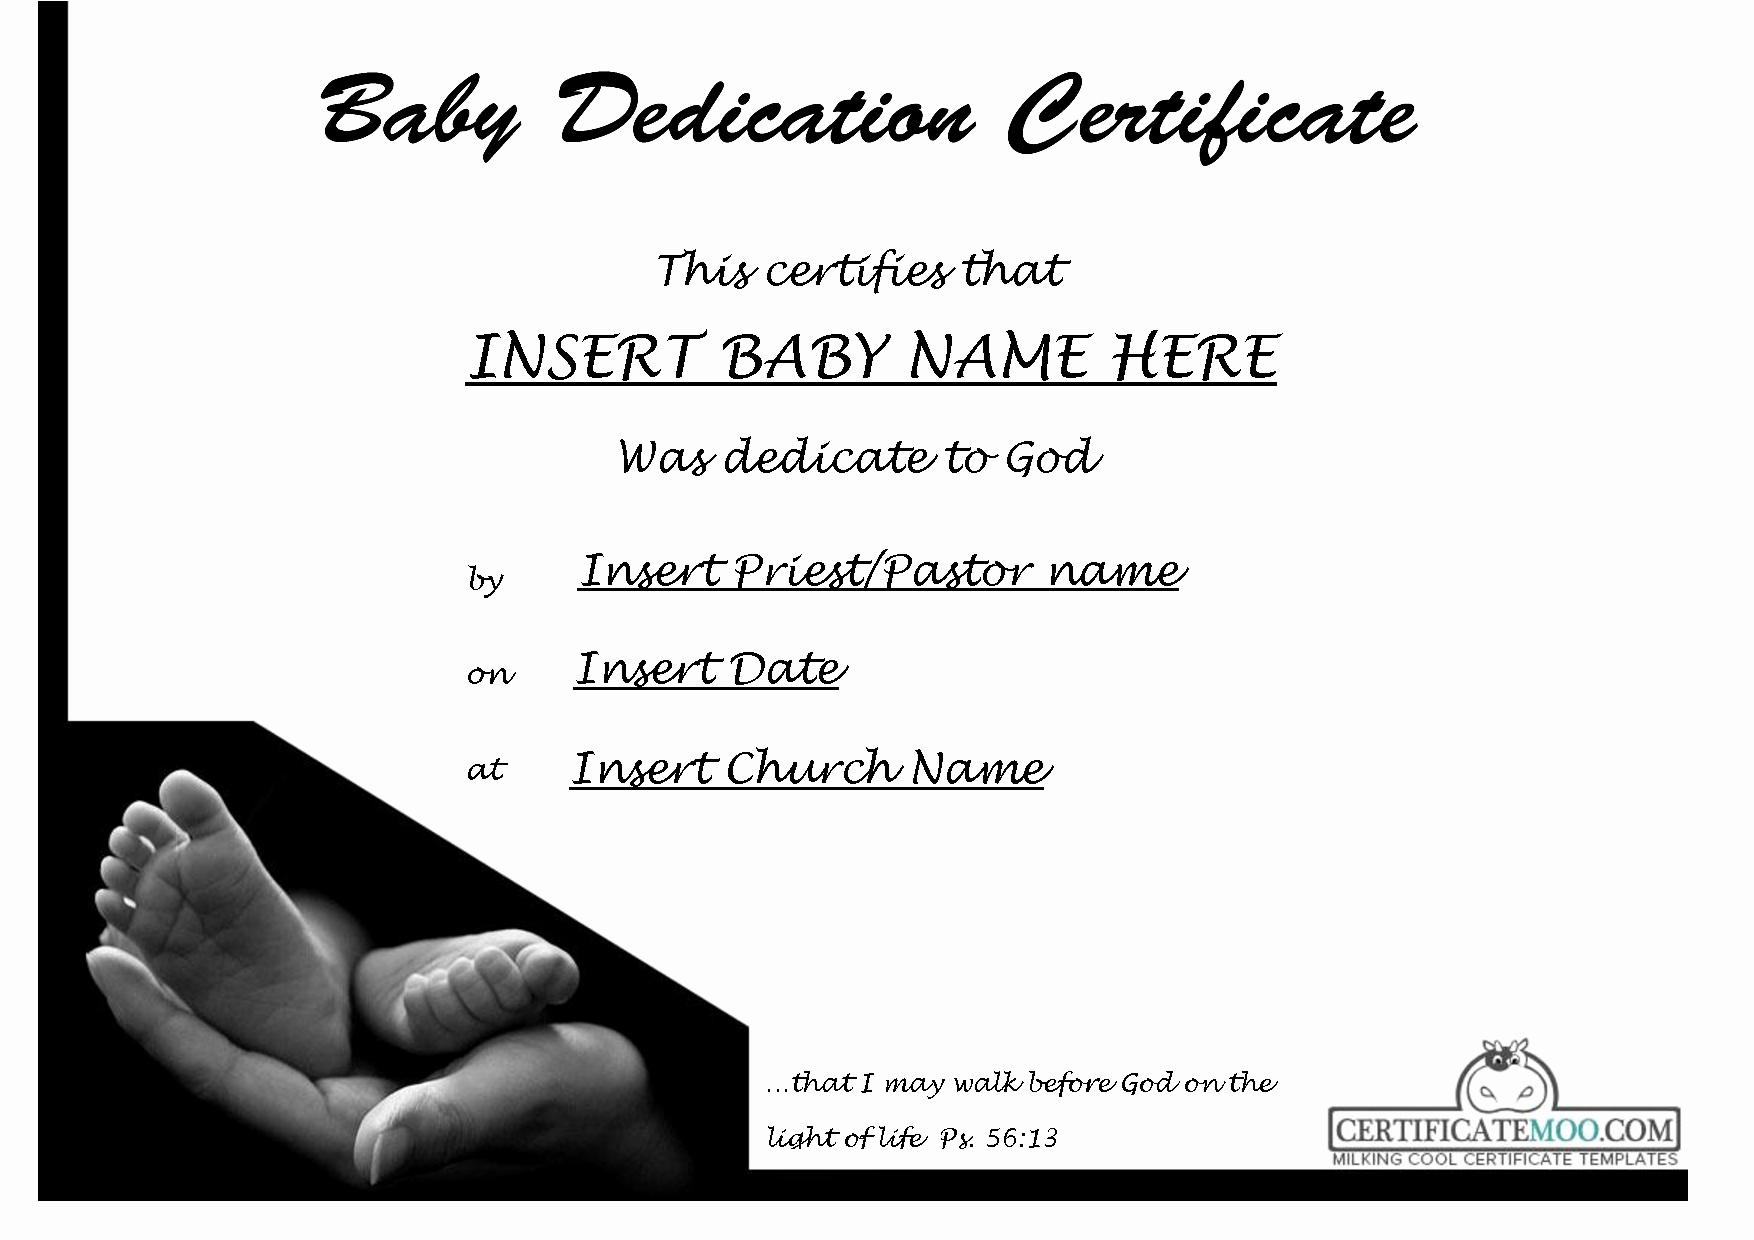 Baby Dedication Certificate Templates Luxury Best S Of Baby Certificate Template Free Printable